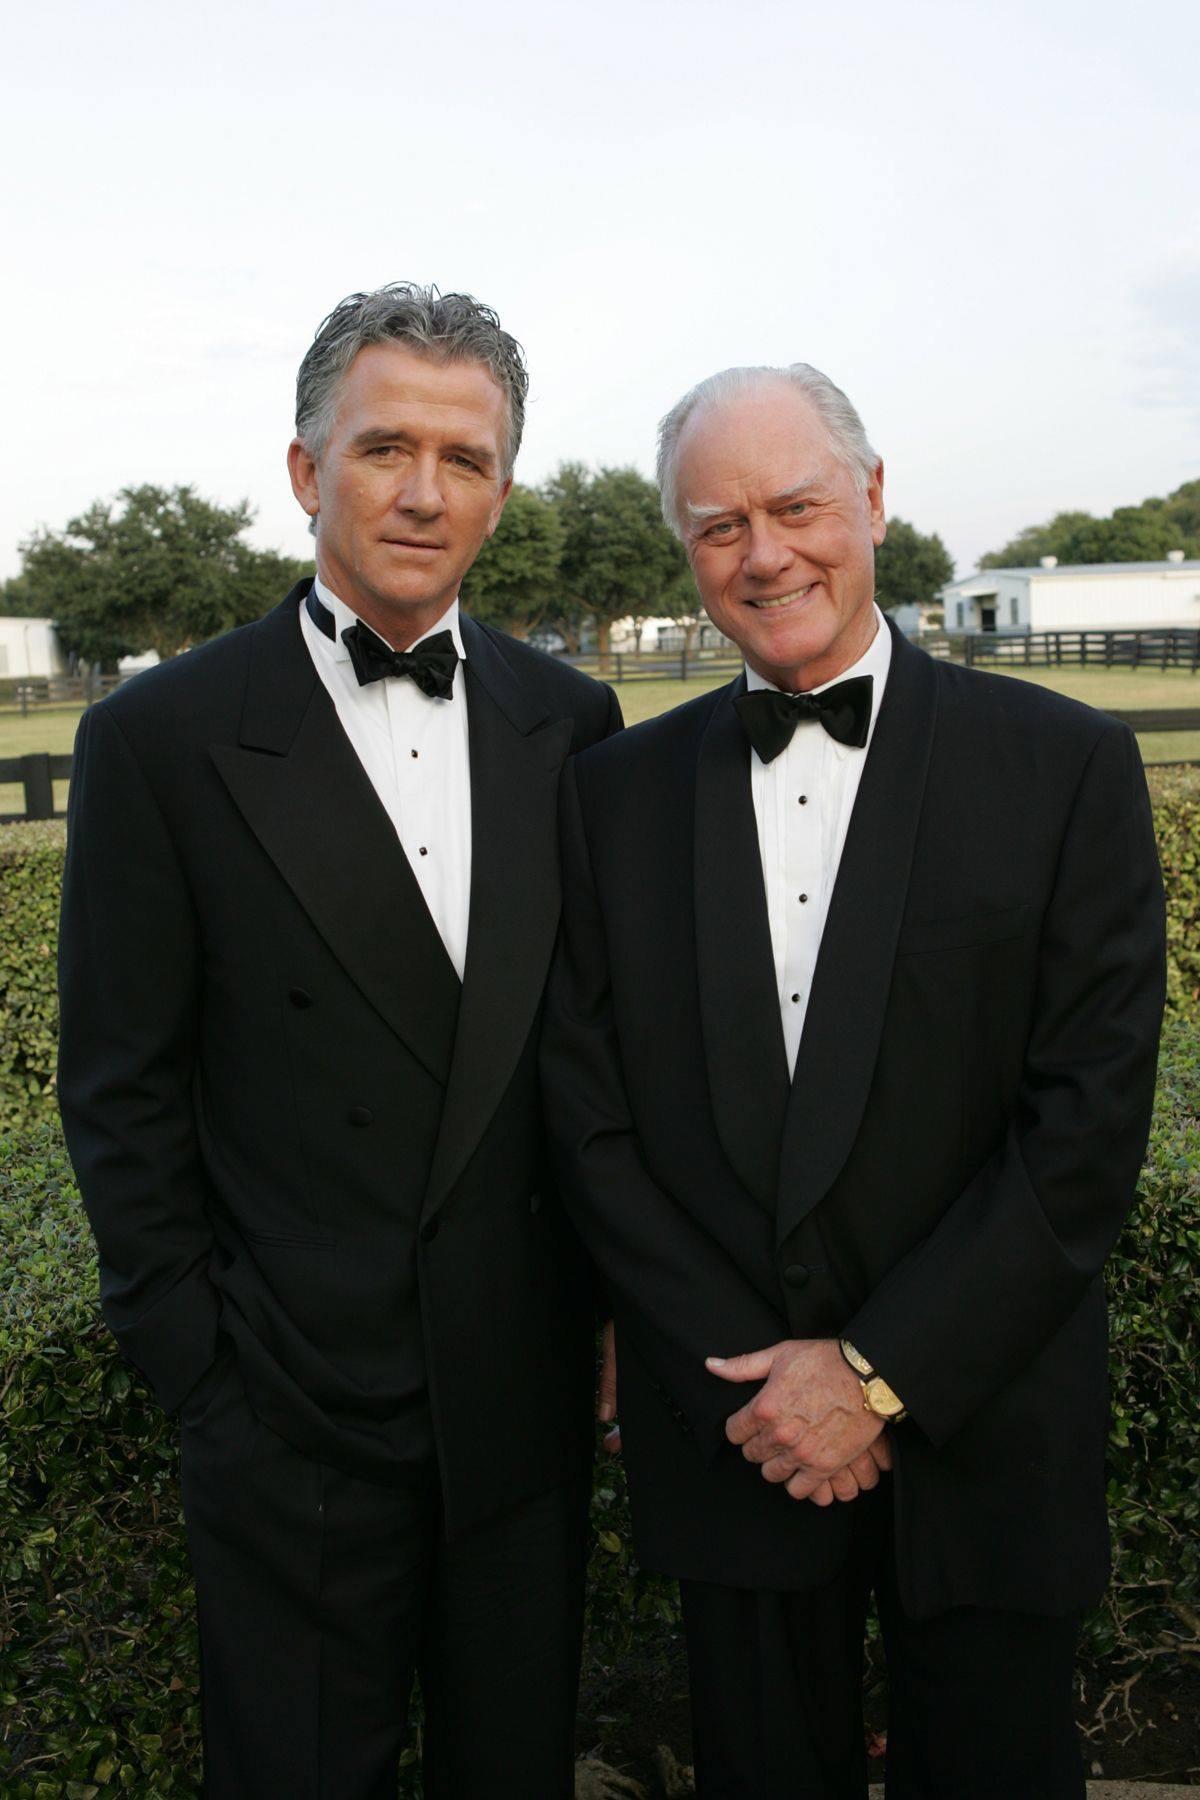 Patrick Duffy and Larry Hagman in Dallas Reunion: Return to Southfork (2004)